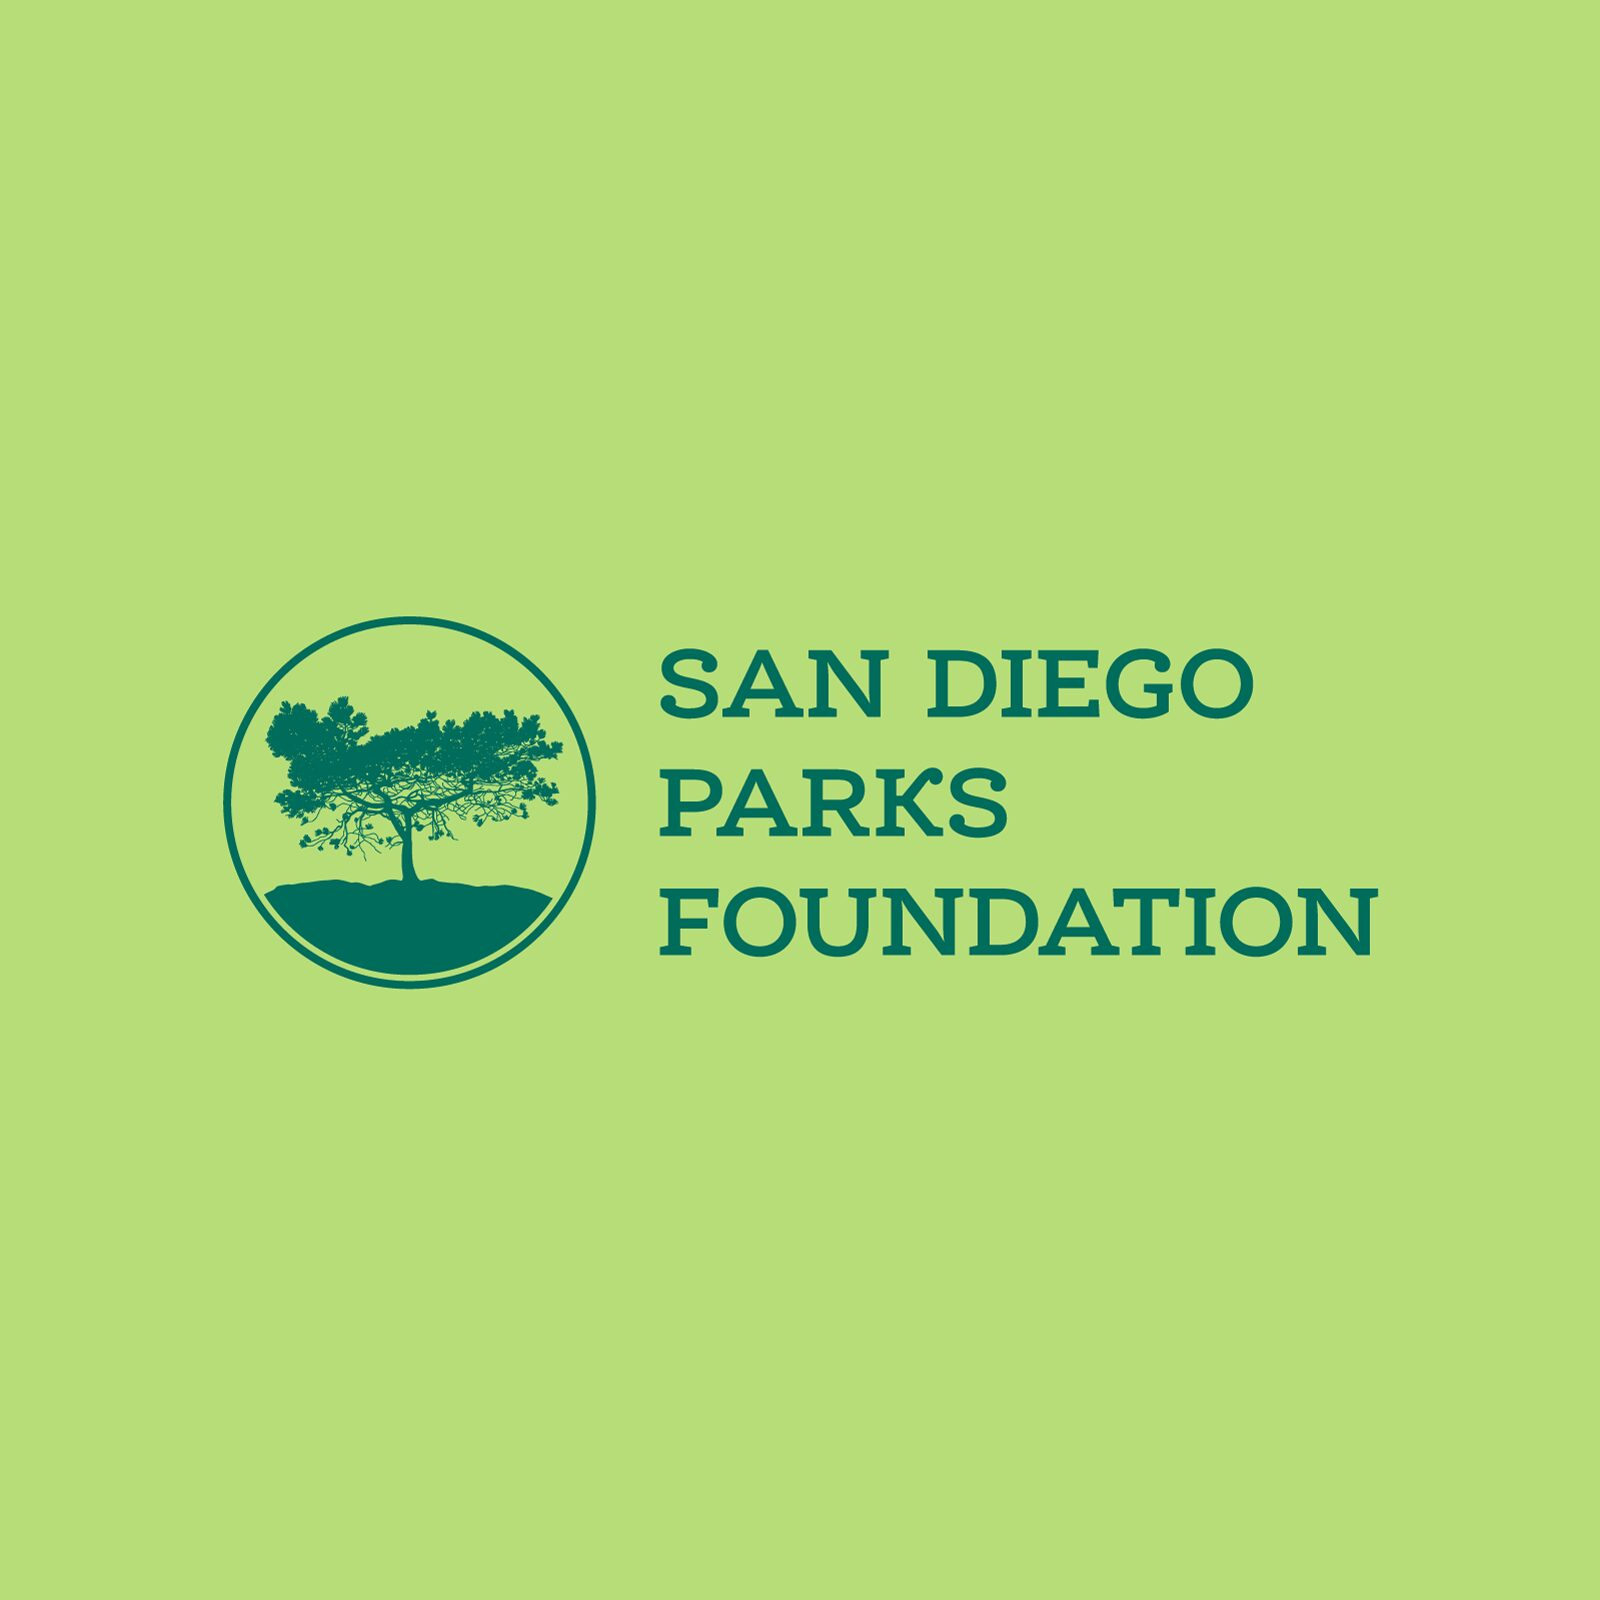 San Diego Parks Foundation logo